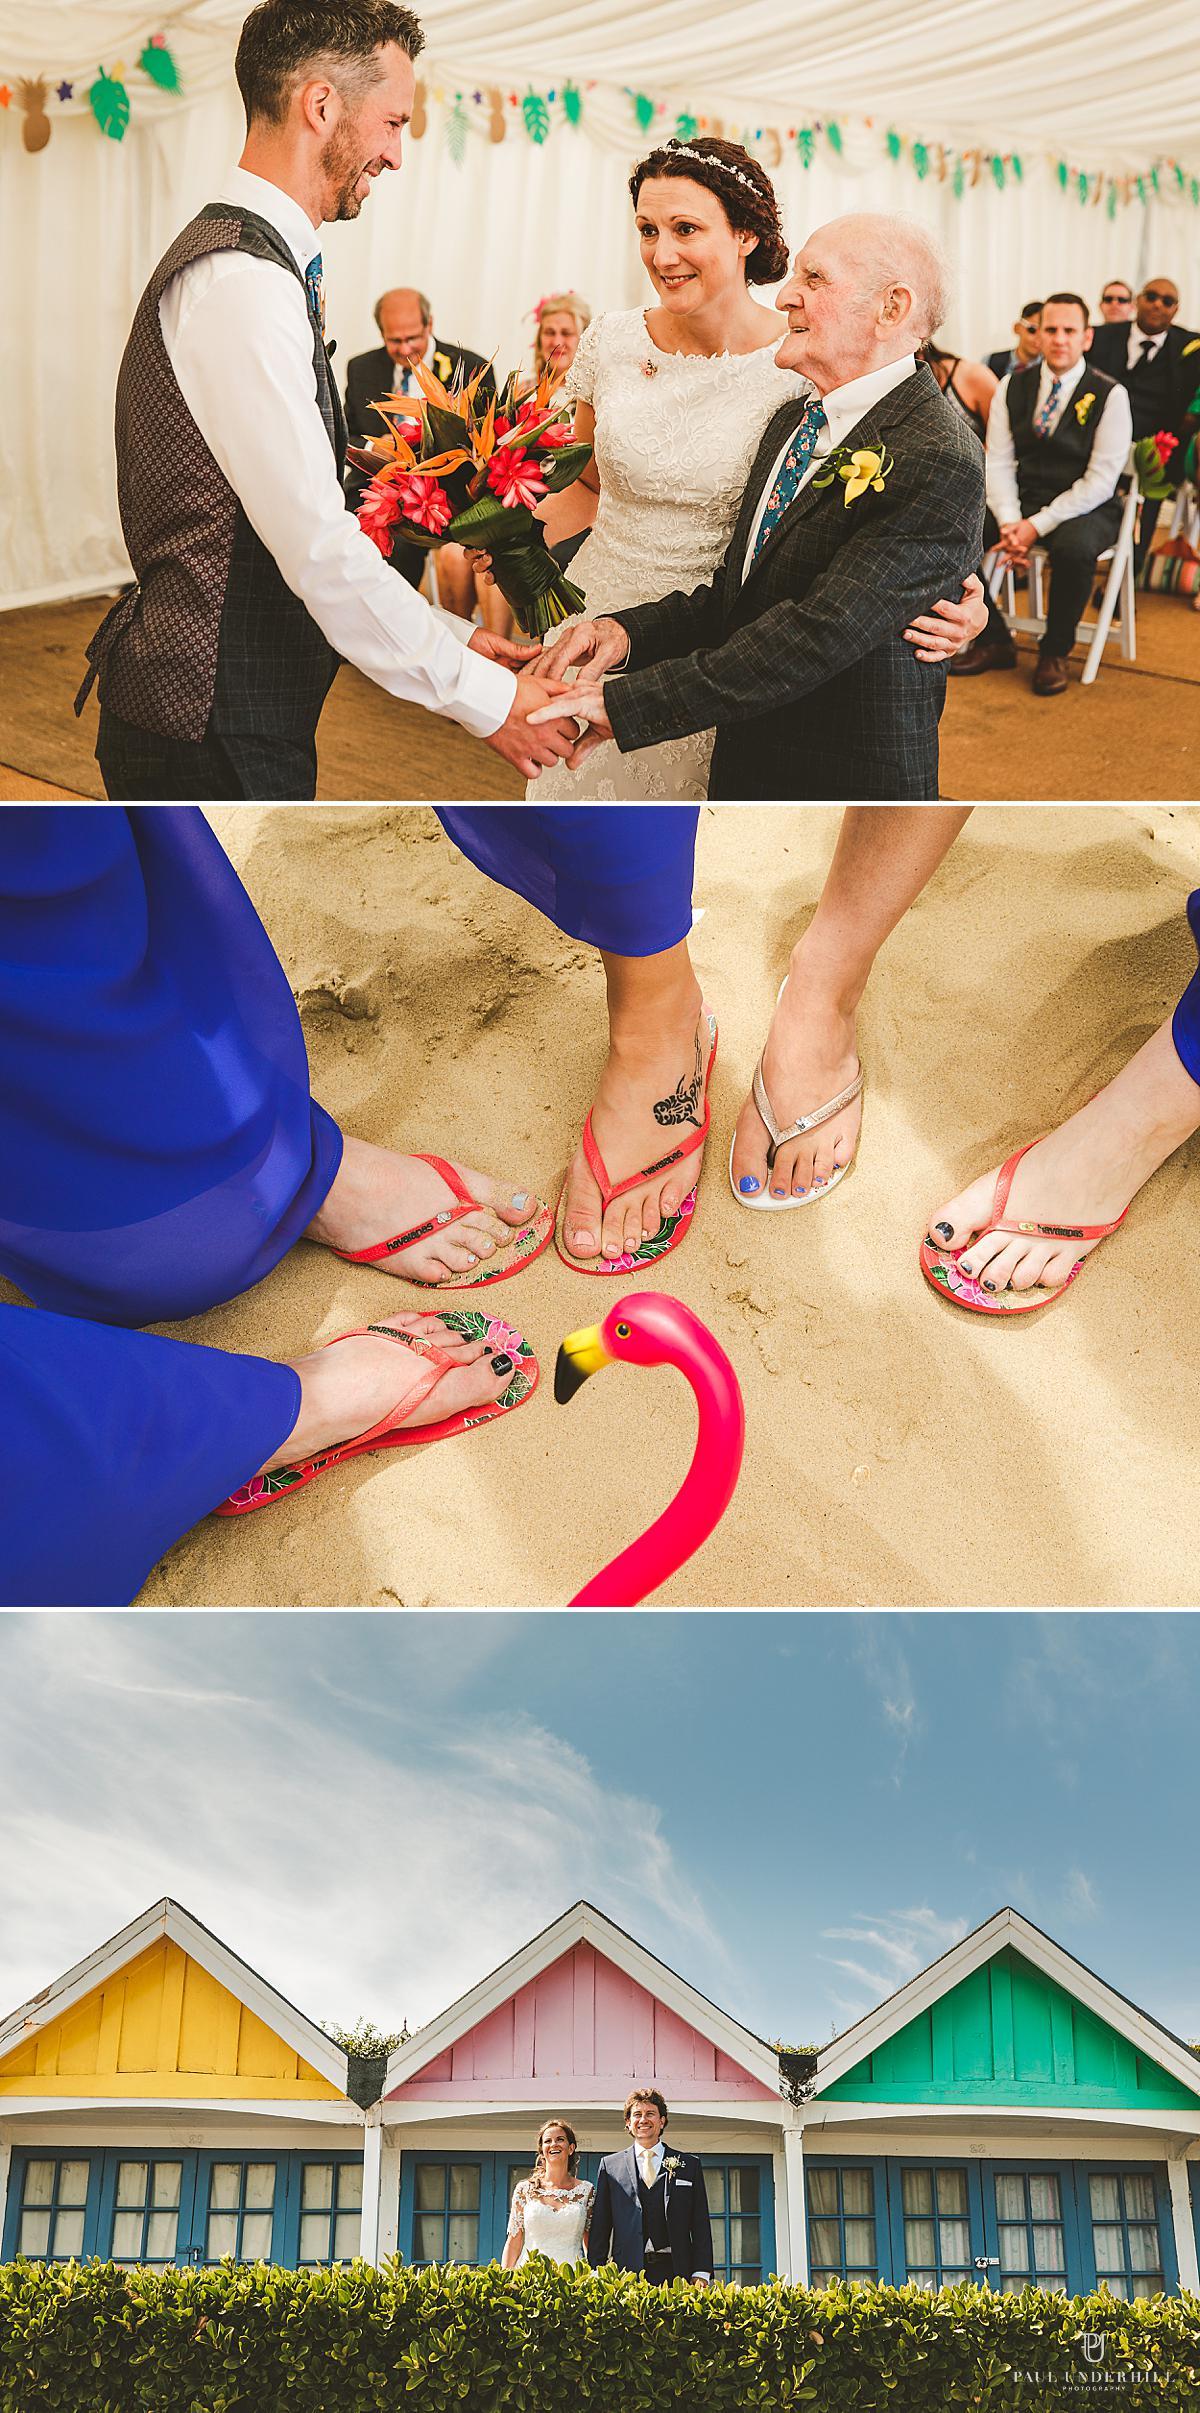 Beach weddings photographer Bournemouth